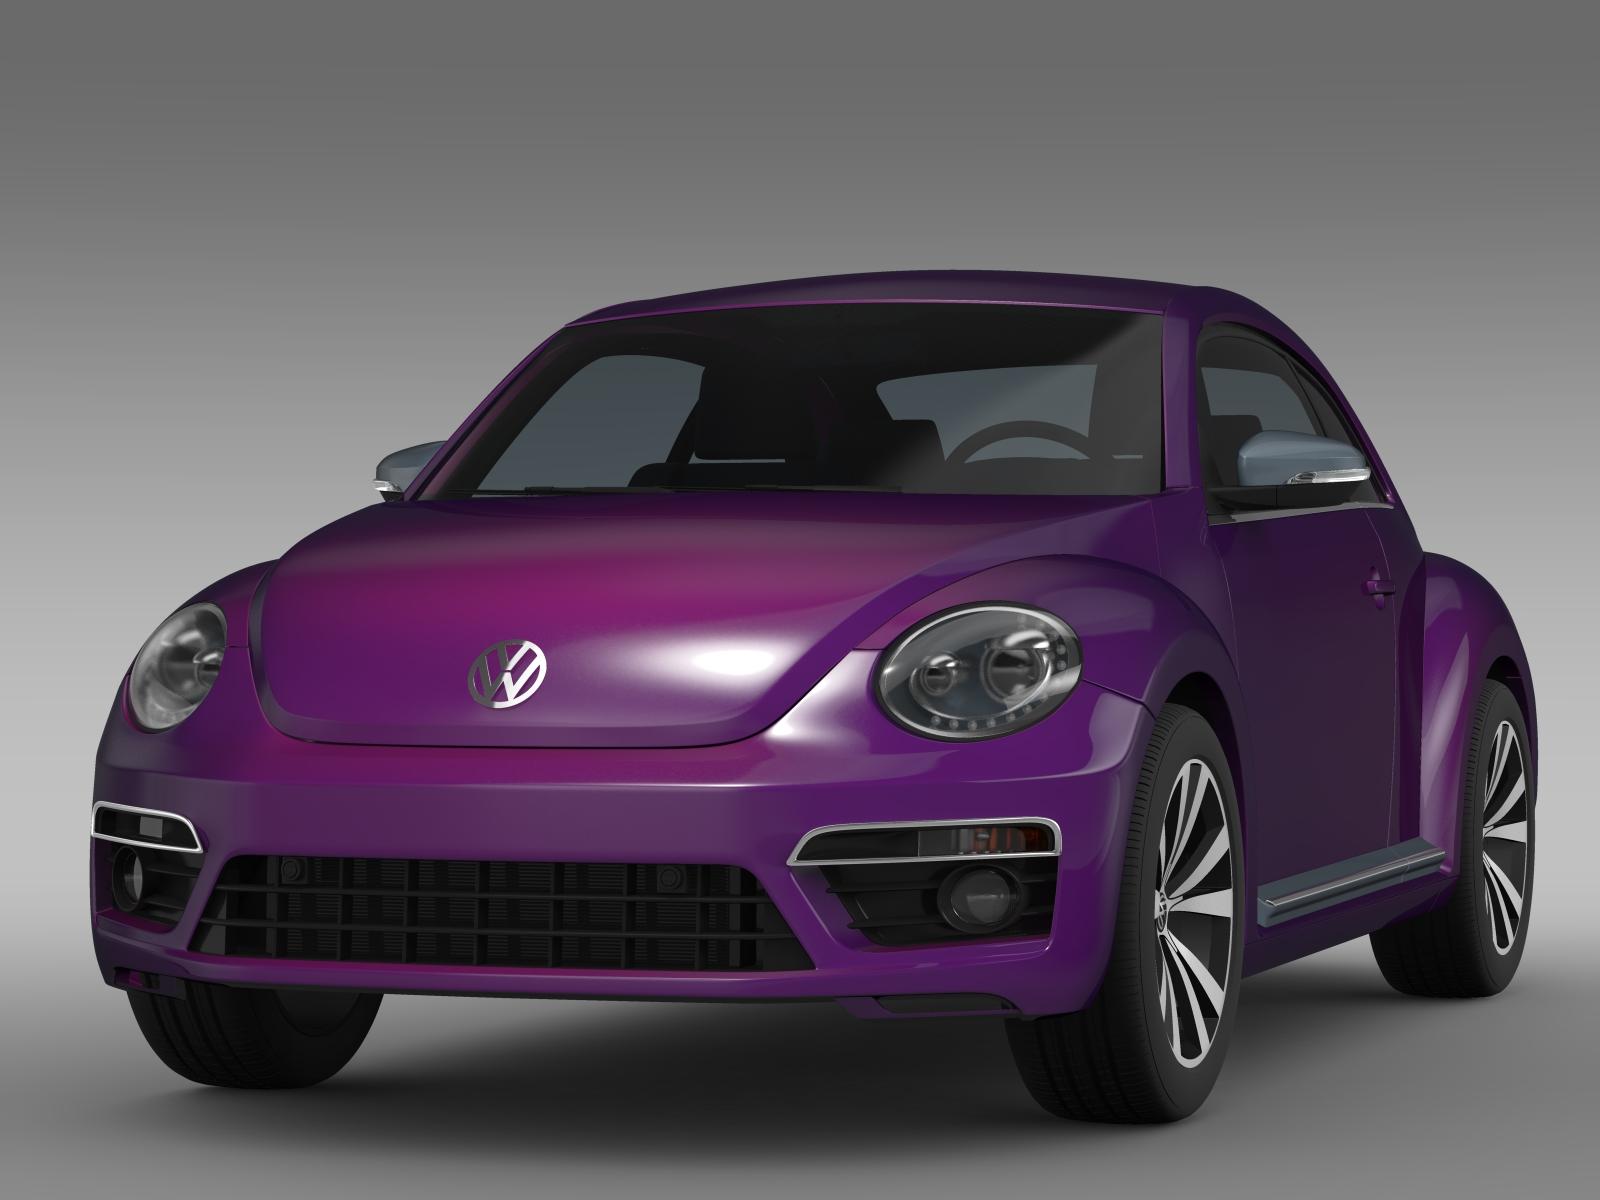 vw beetle pink edition concept 2015 3d model buy vw beetle pink edition concept 2015 3d model. Black Bedroom Furniture Sets. Home Design Ideas